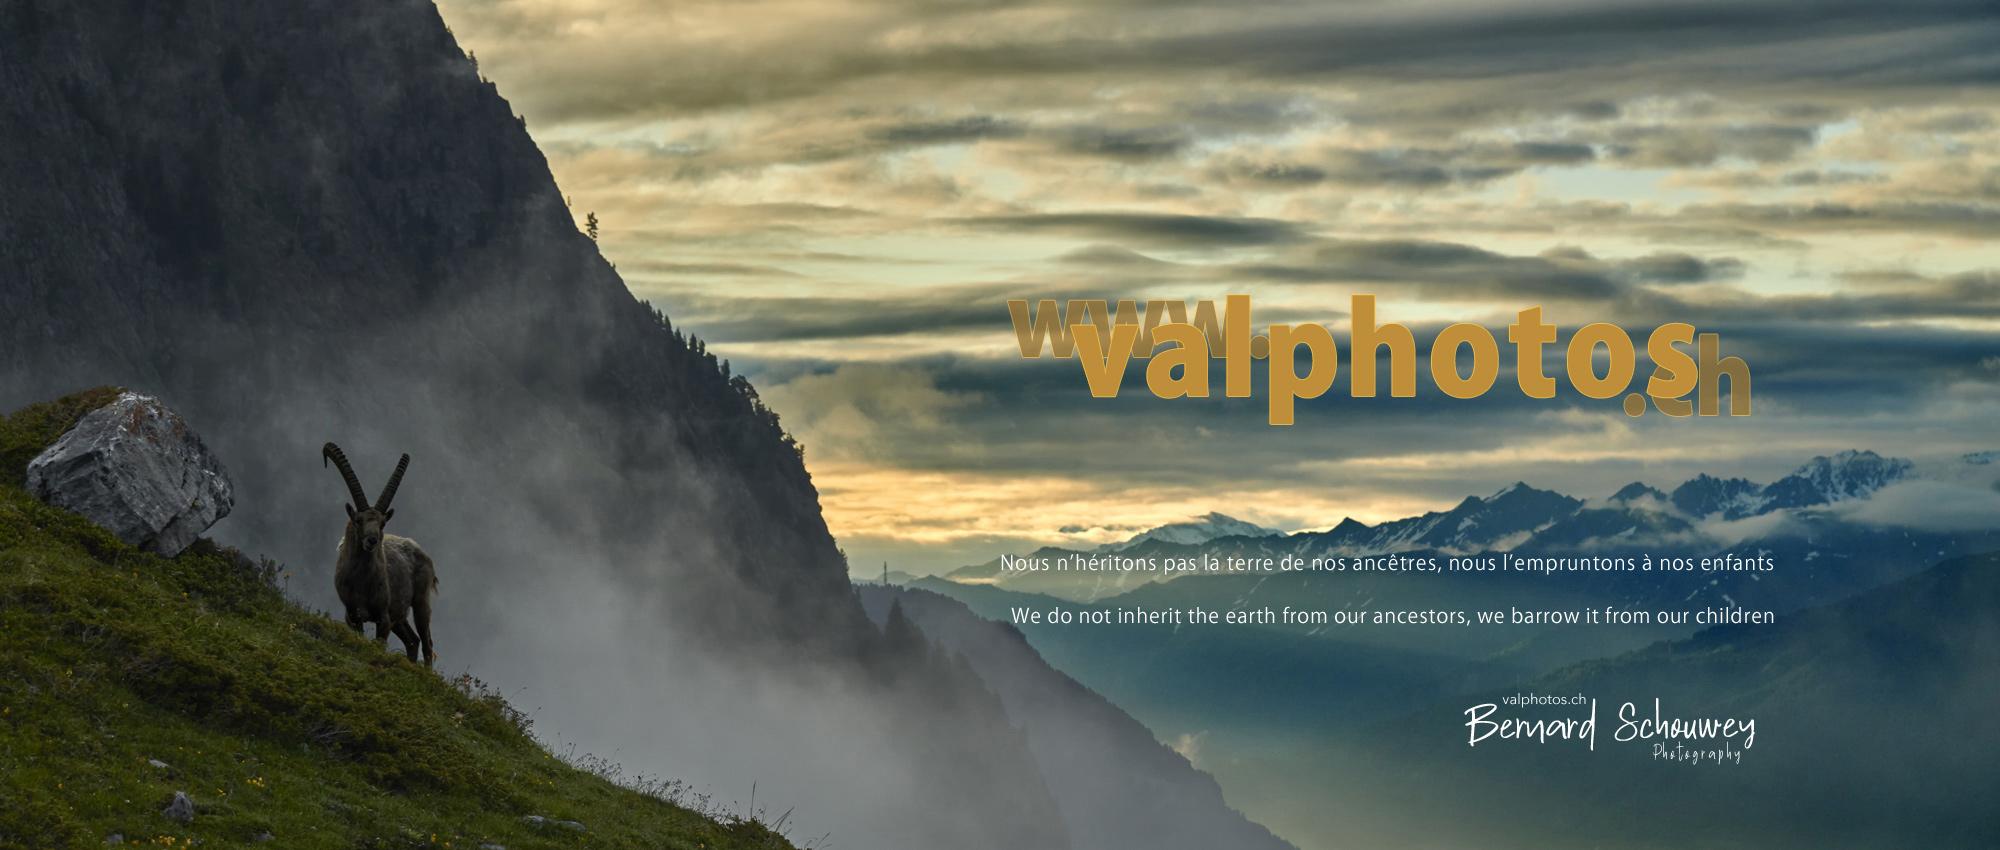 Valphotos.ch